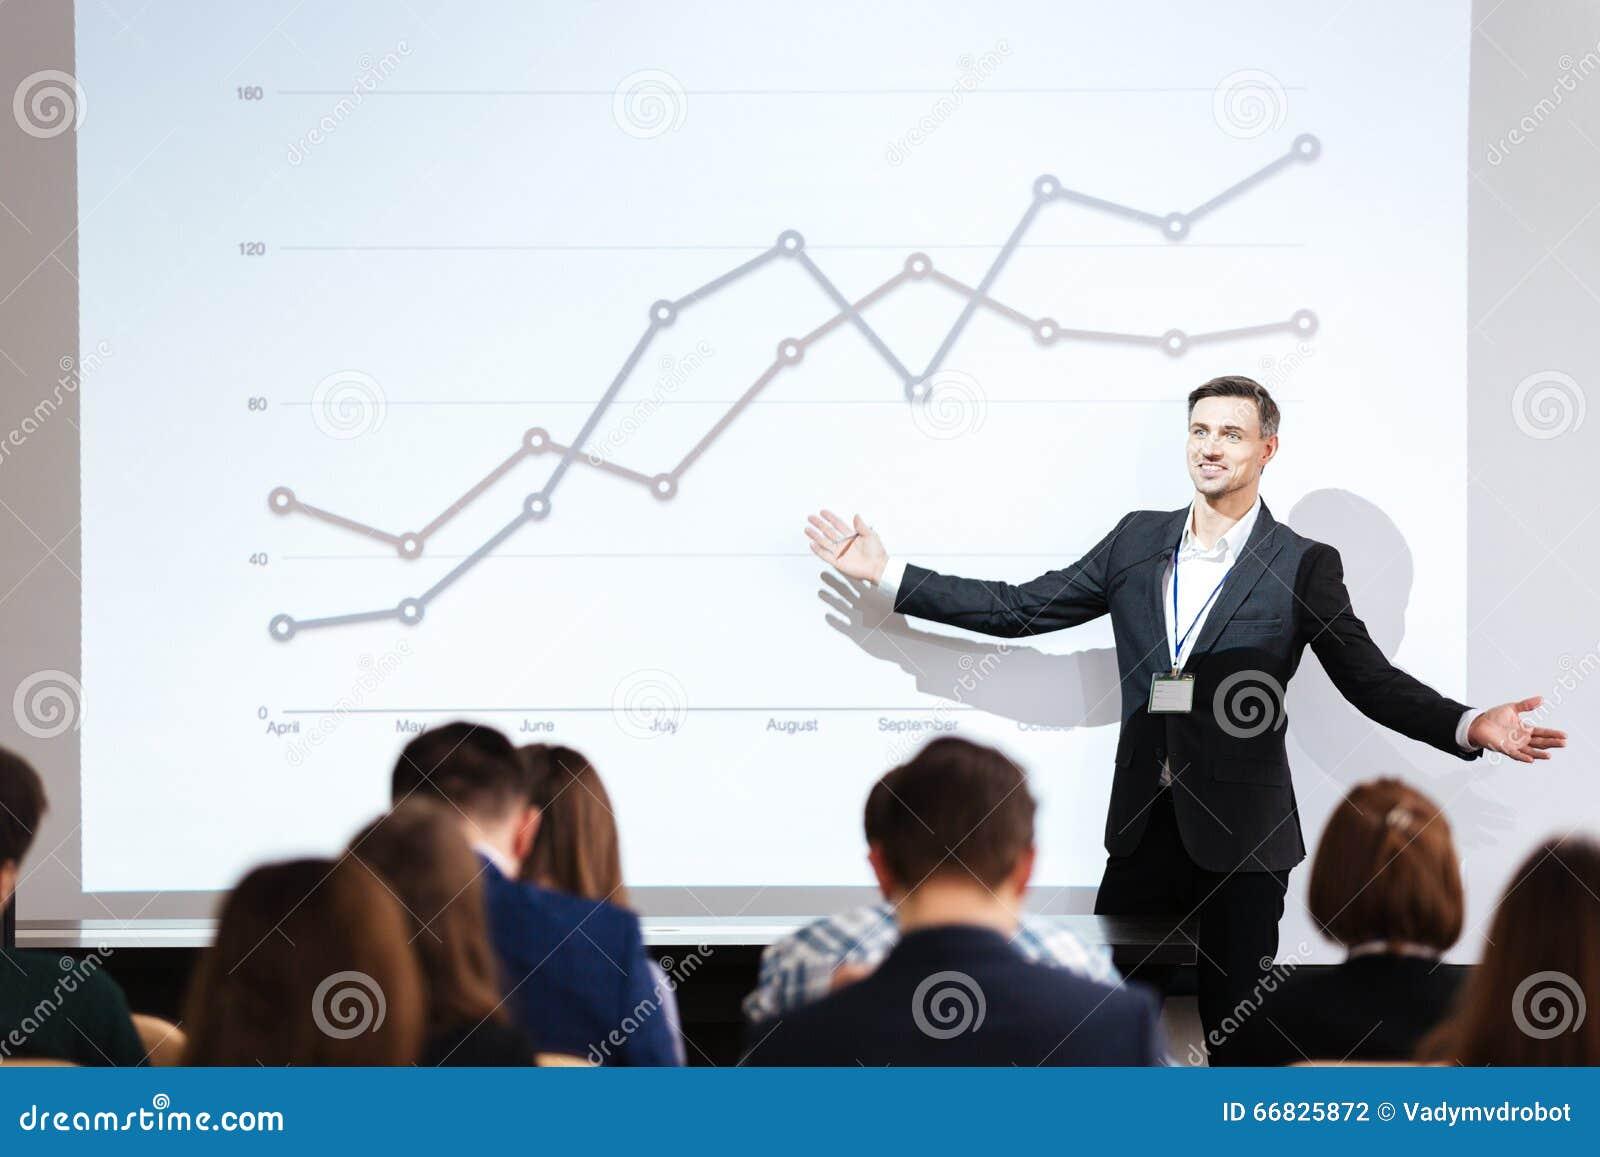 Speaker giving public presentation in conference hall